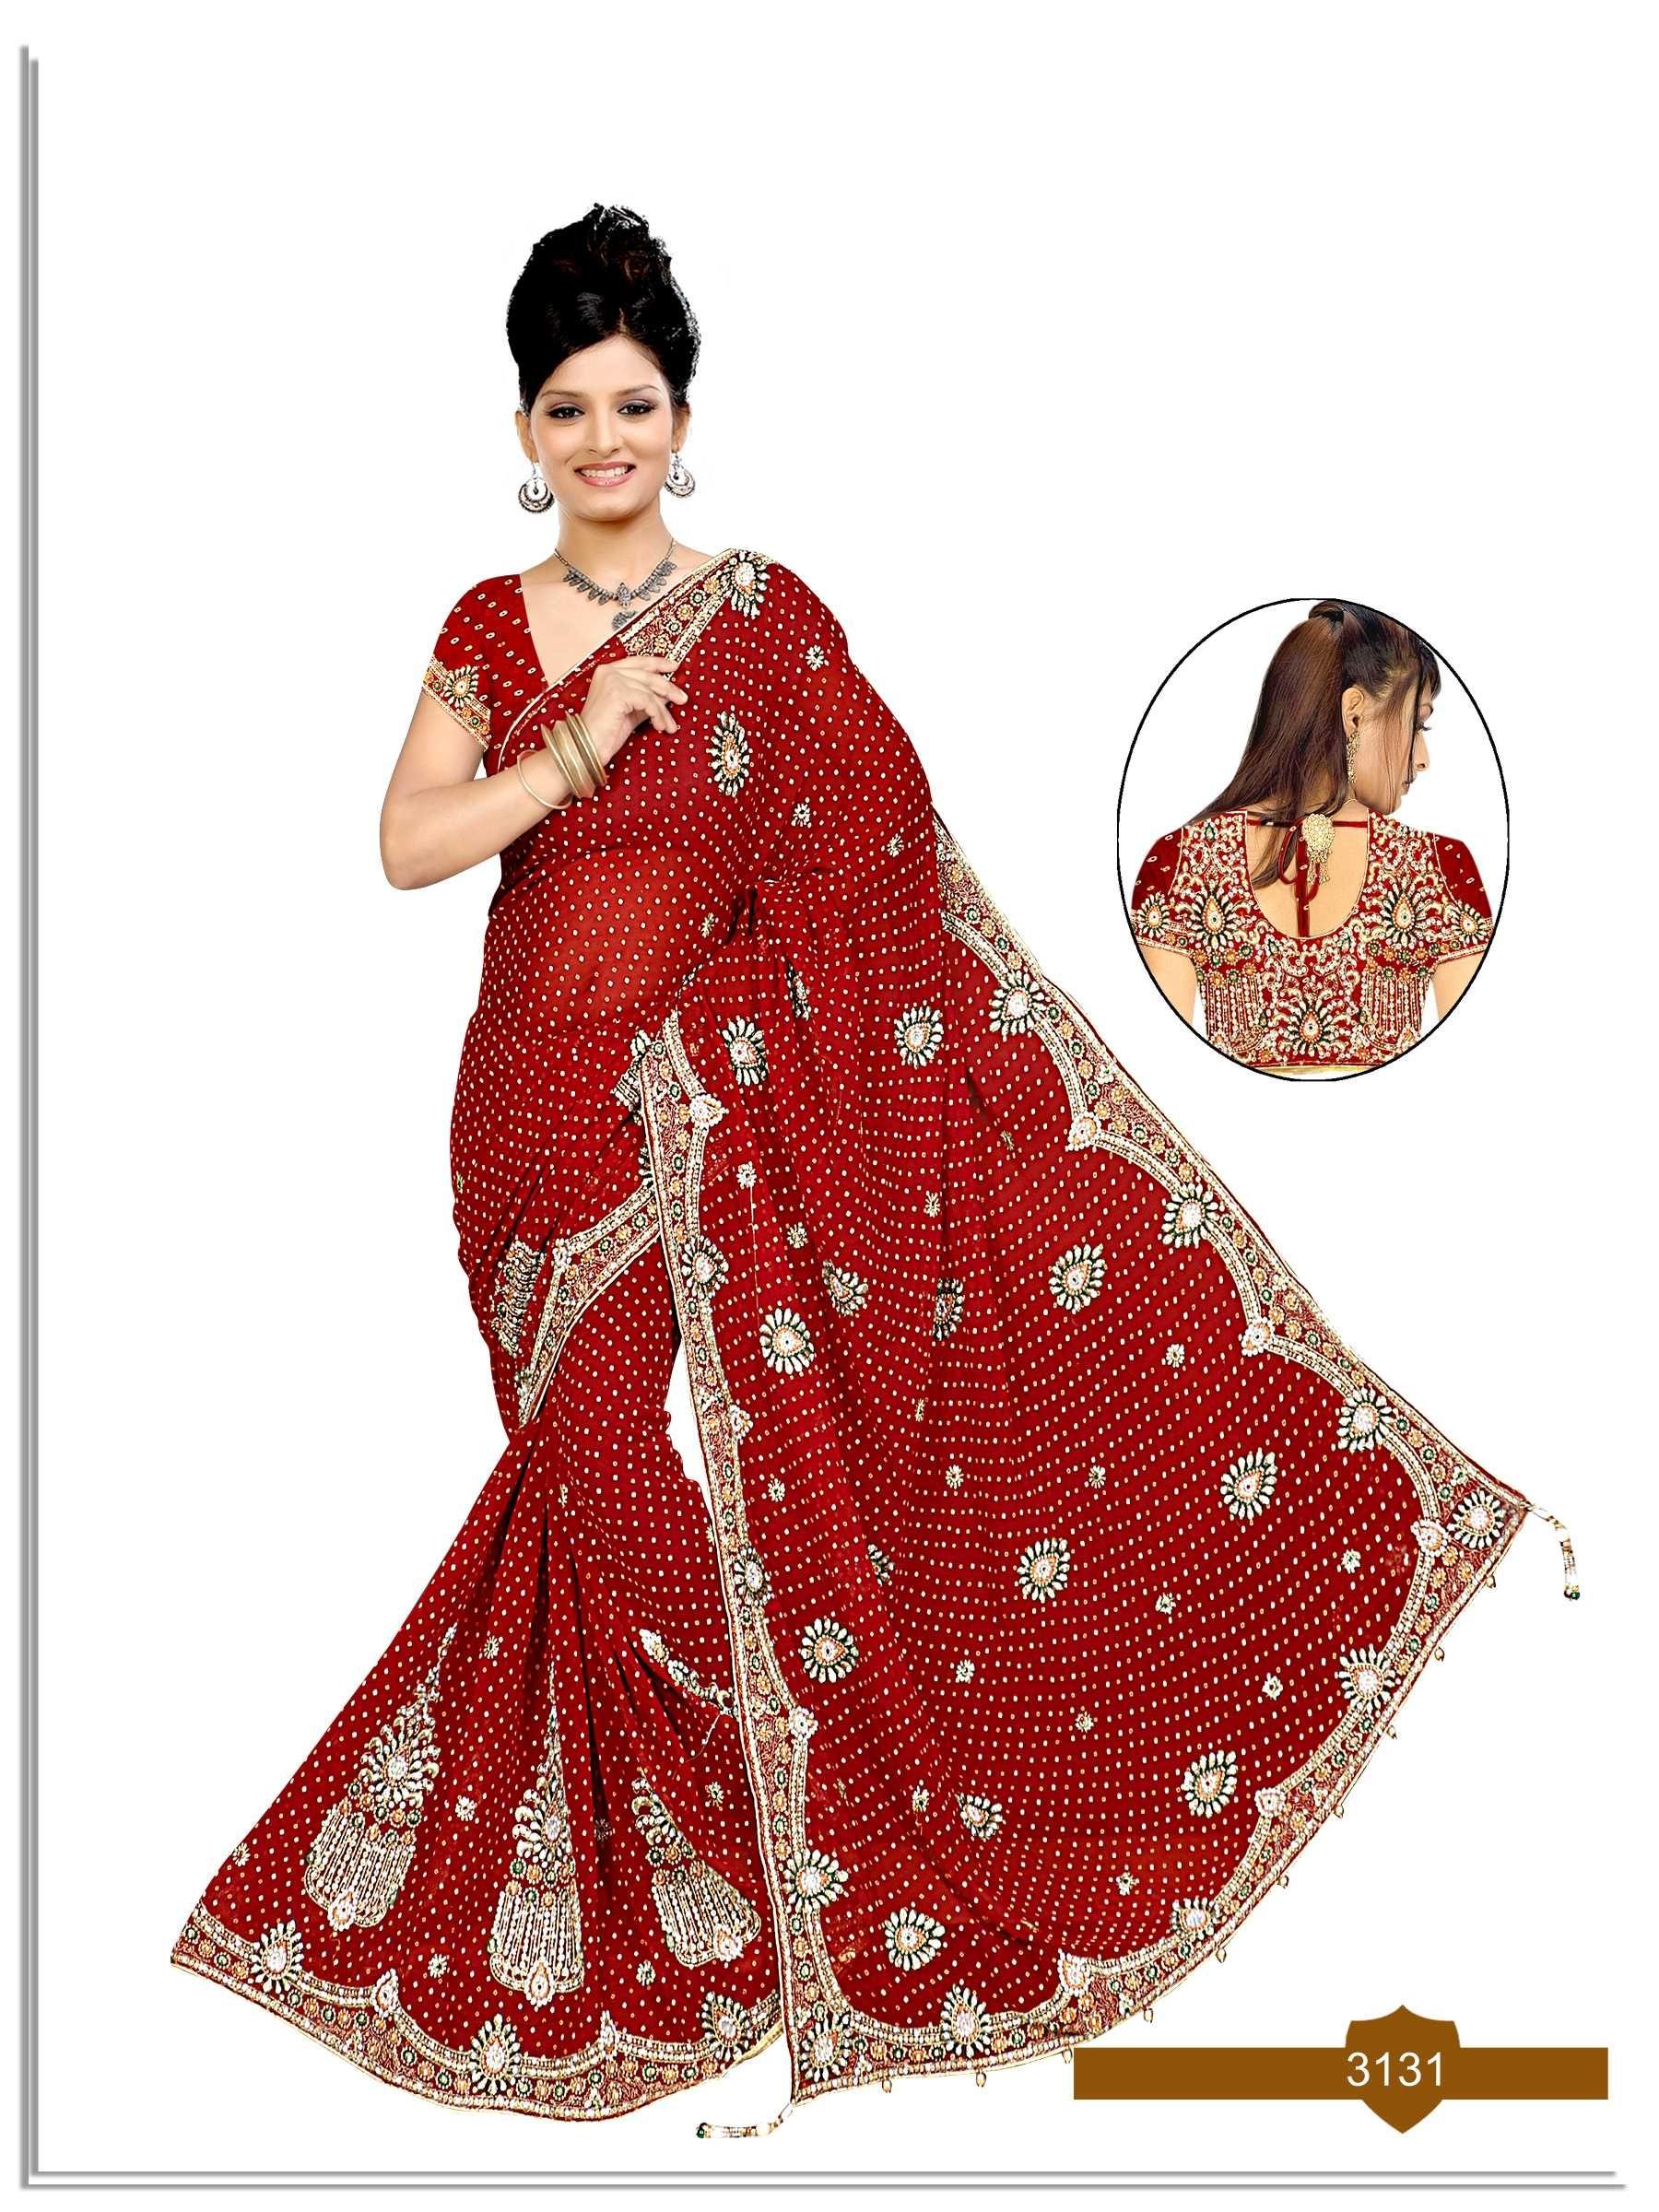 b24361044a This #heavy #Designer #work #bandhani, #Bandhej, #Chunari, #wedding,  #gharchola #saree are in #Georgette, #Viscose and #Jaquard fabrics. Work on this  saree ...